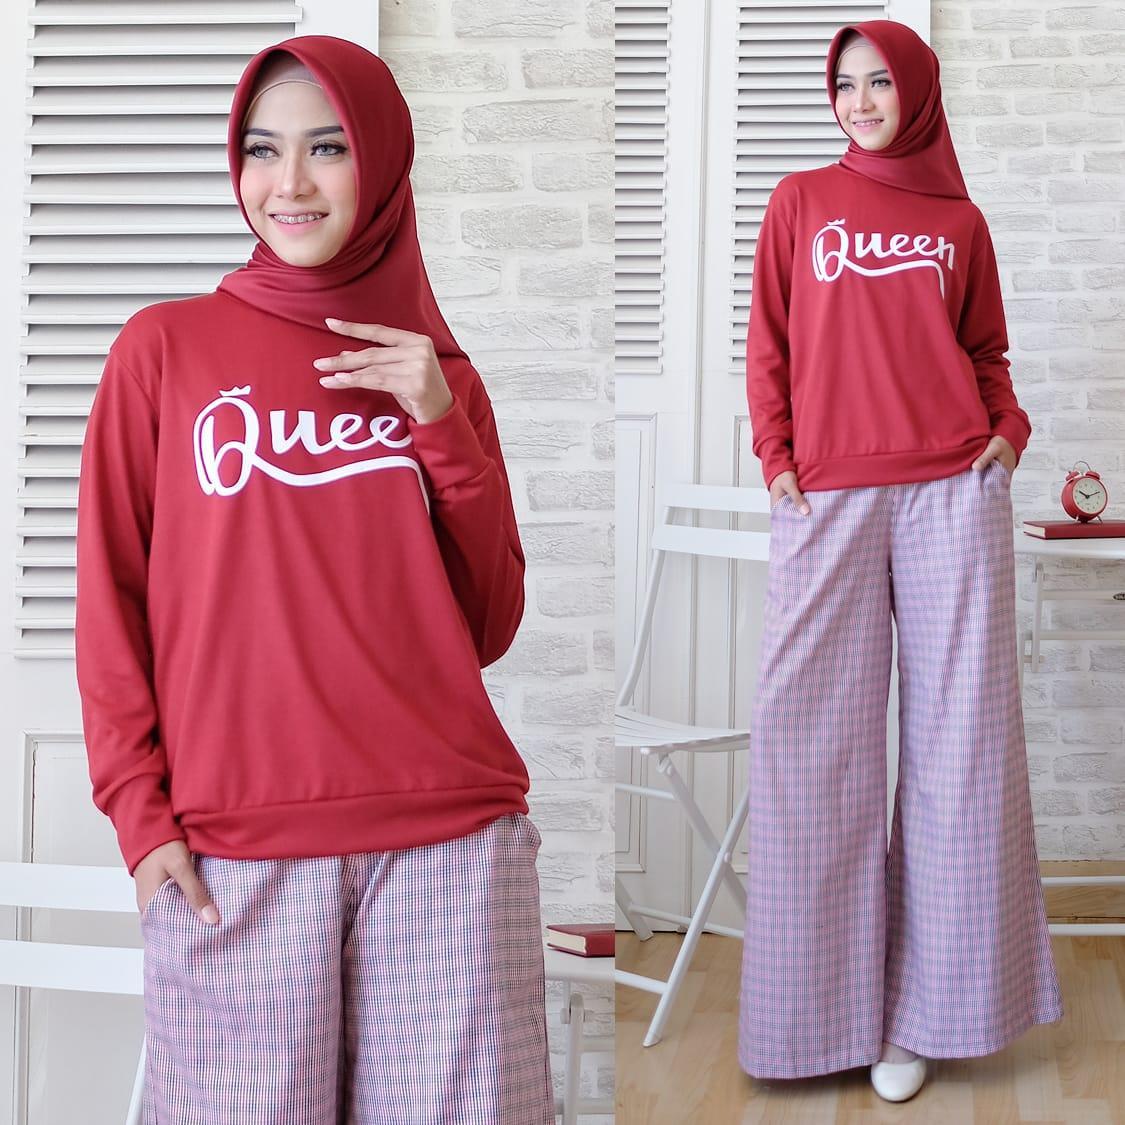 Jkt Hijab Grosir Fashion Setelan Queen Sabyan / Dress Maxi / Maxi Muslim / Setelan Maxi Dress  / Baju Rok Muslim / Setelan Busana Muslim / Setelan Baju Muslim / Baju Gamis Wanita / Setelan Muslim / Hijab Fashion / Hijab Style / Baju Santai Muslim